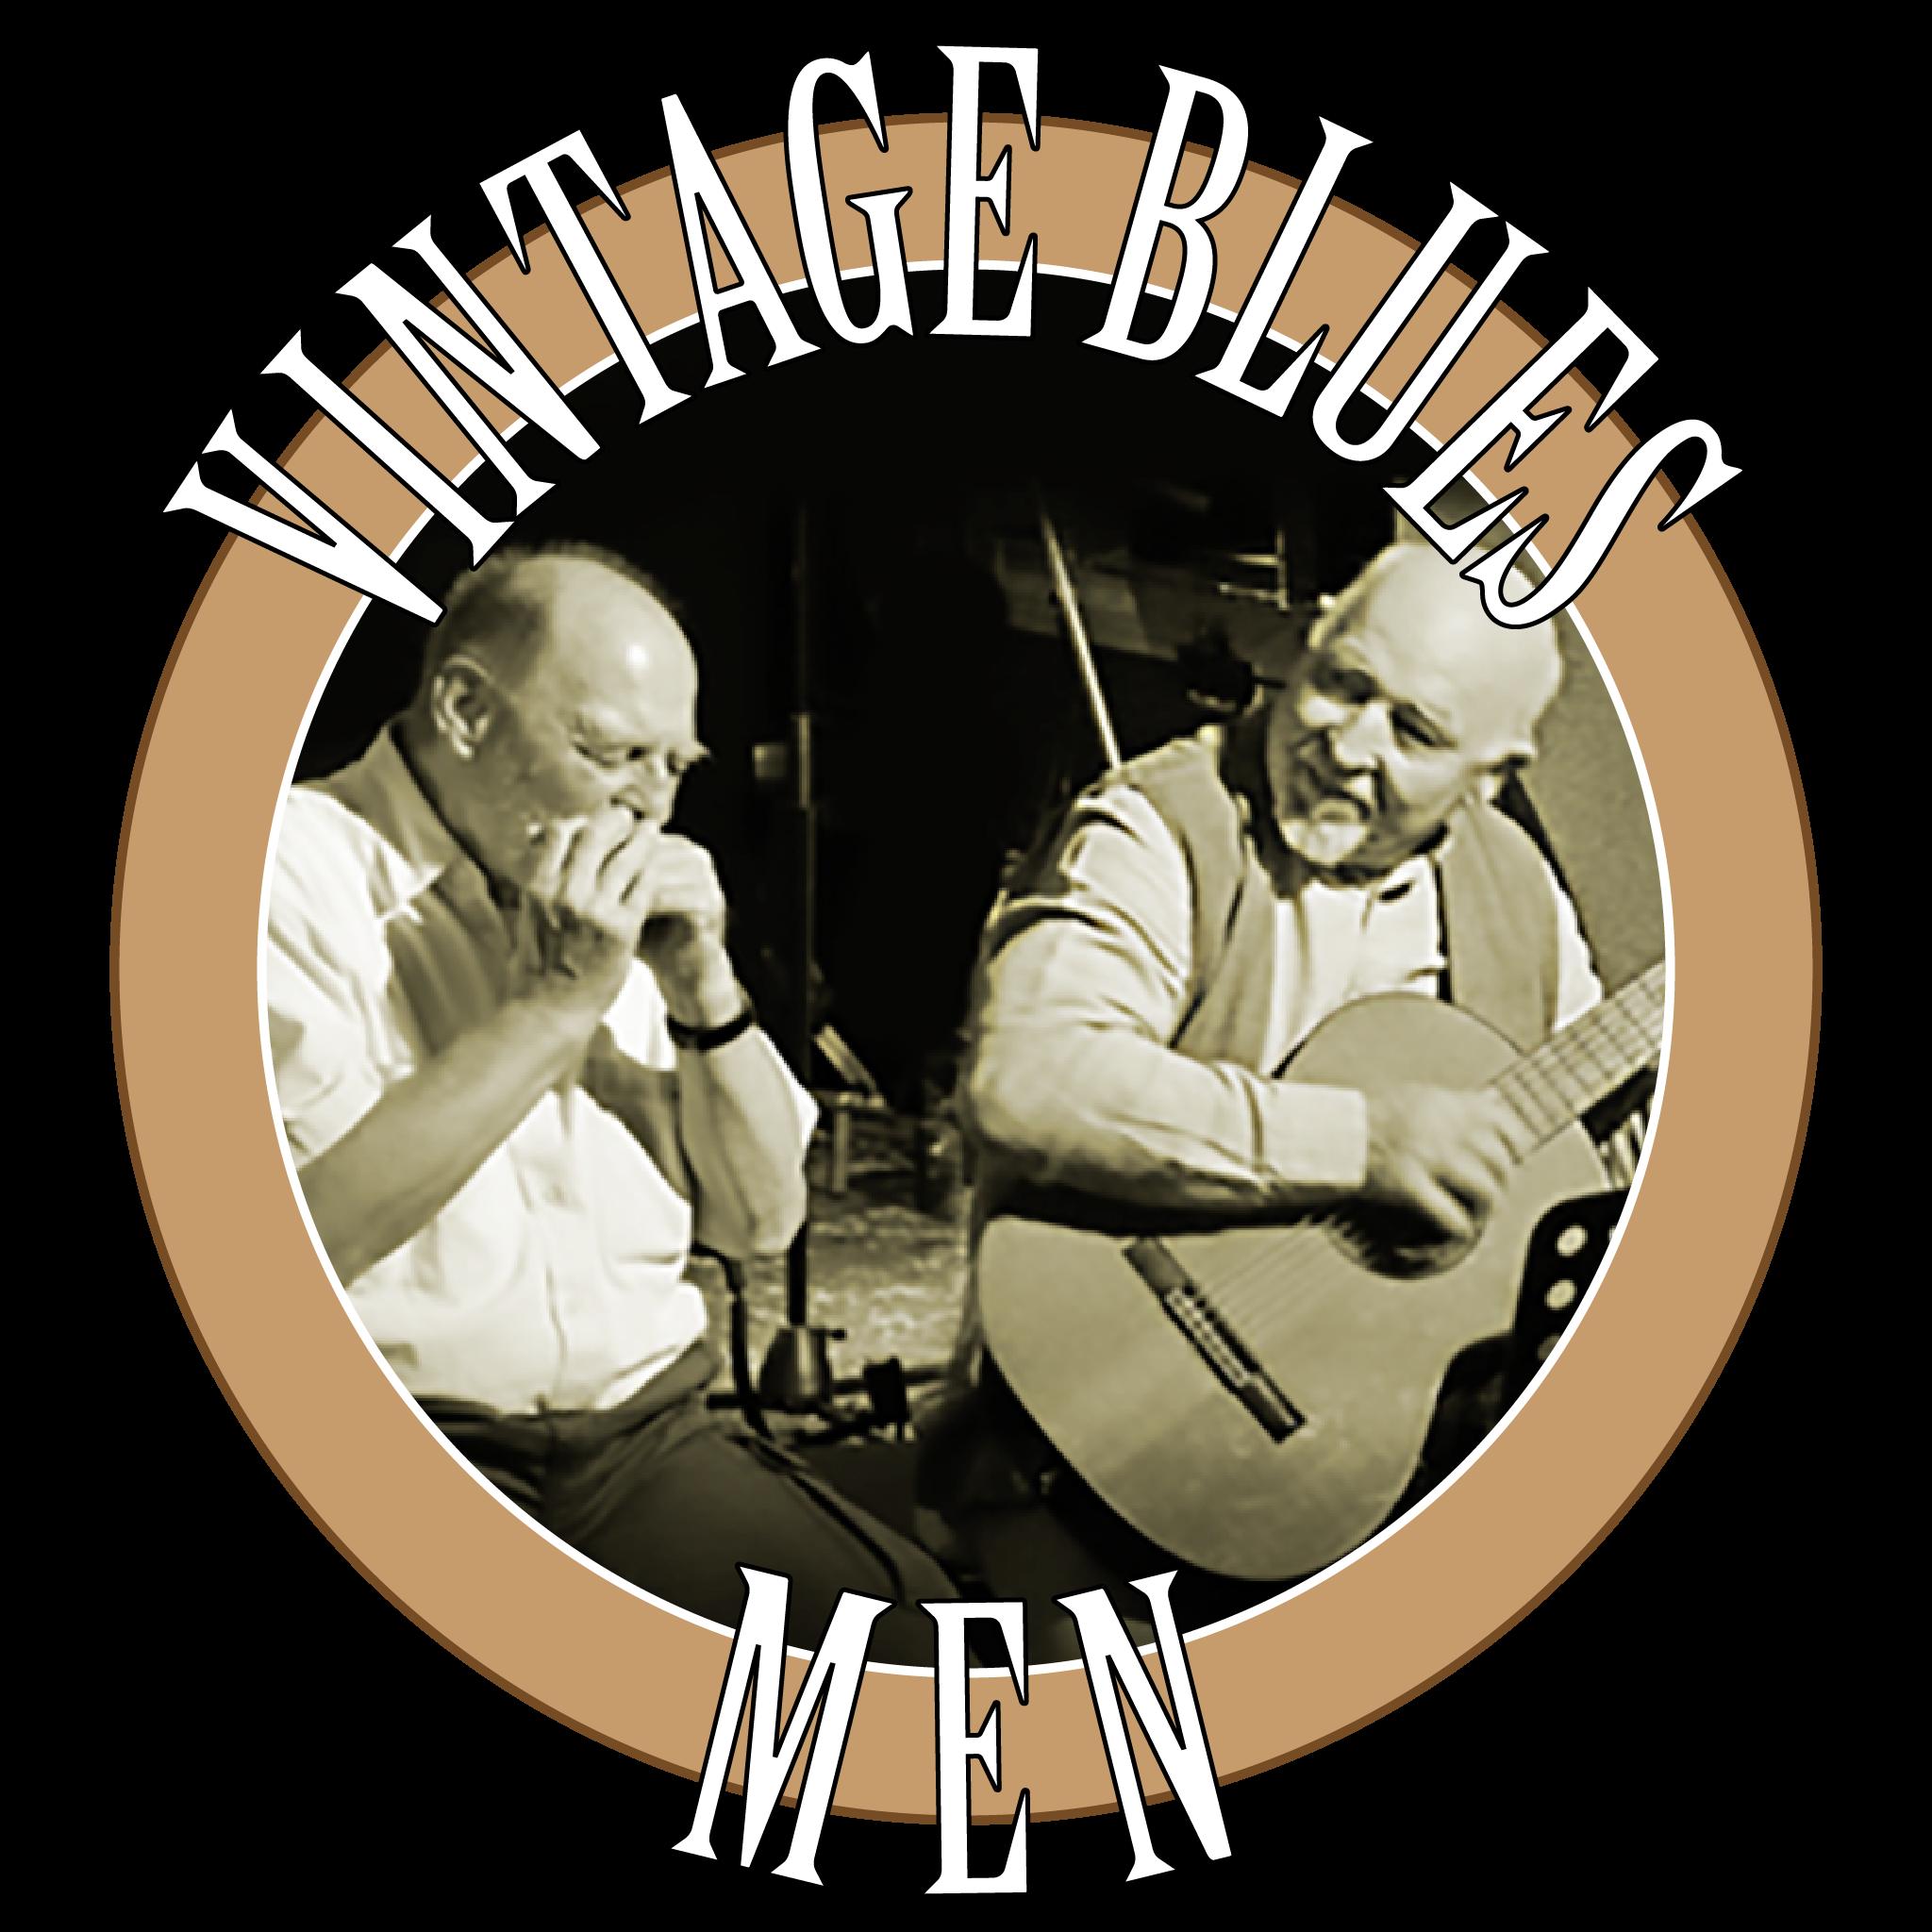 Vintagebluesmen